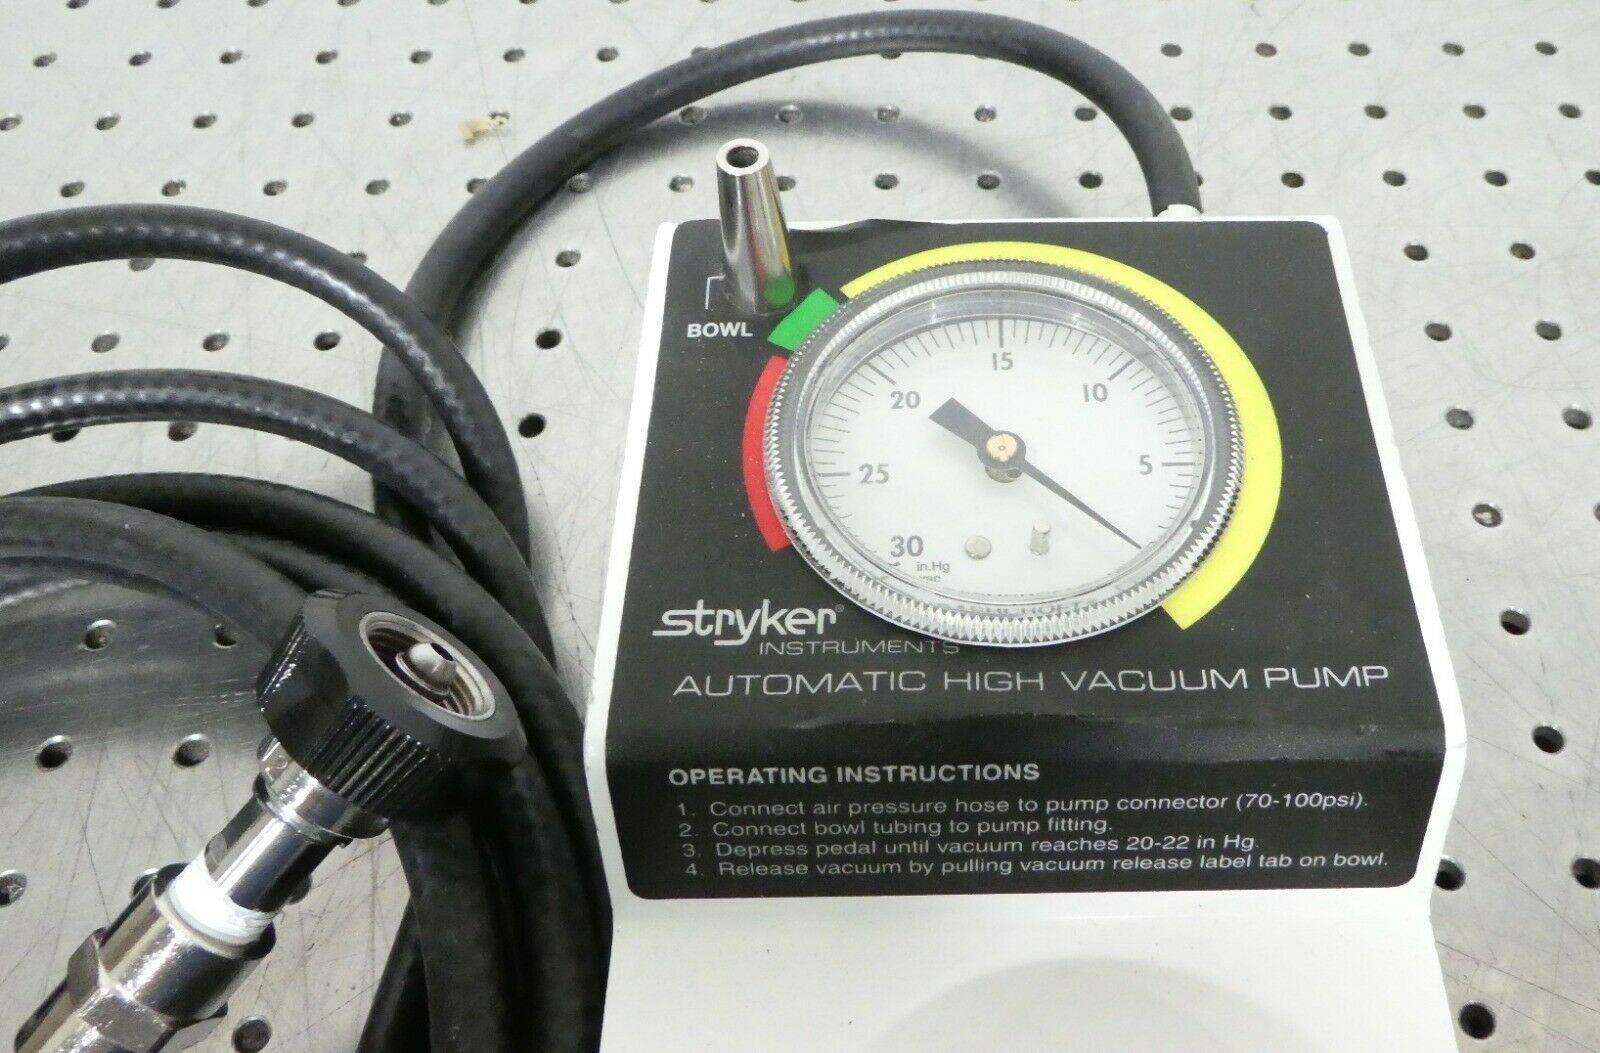 R162413 Stryker Automatic High Vacuum Foot Pump 0206-500-000